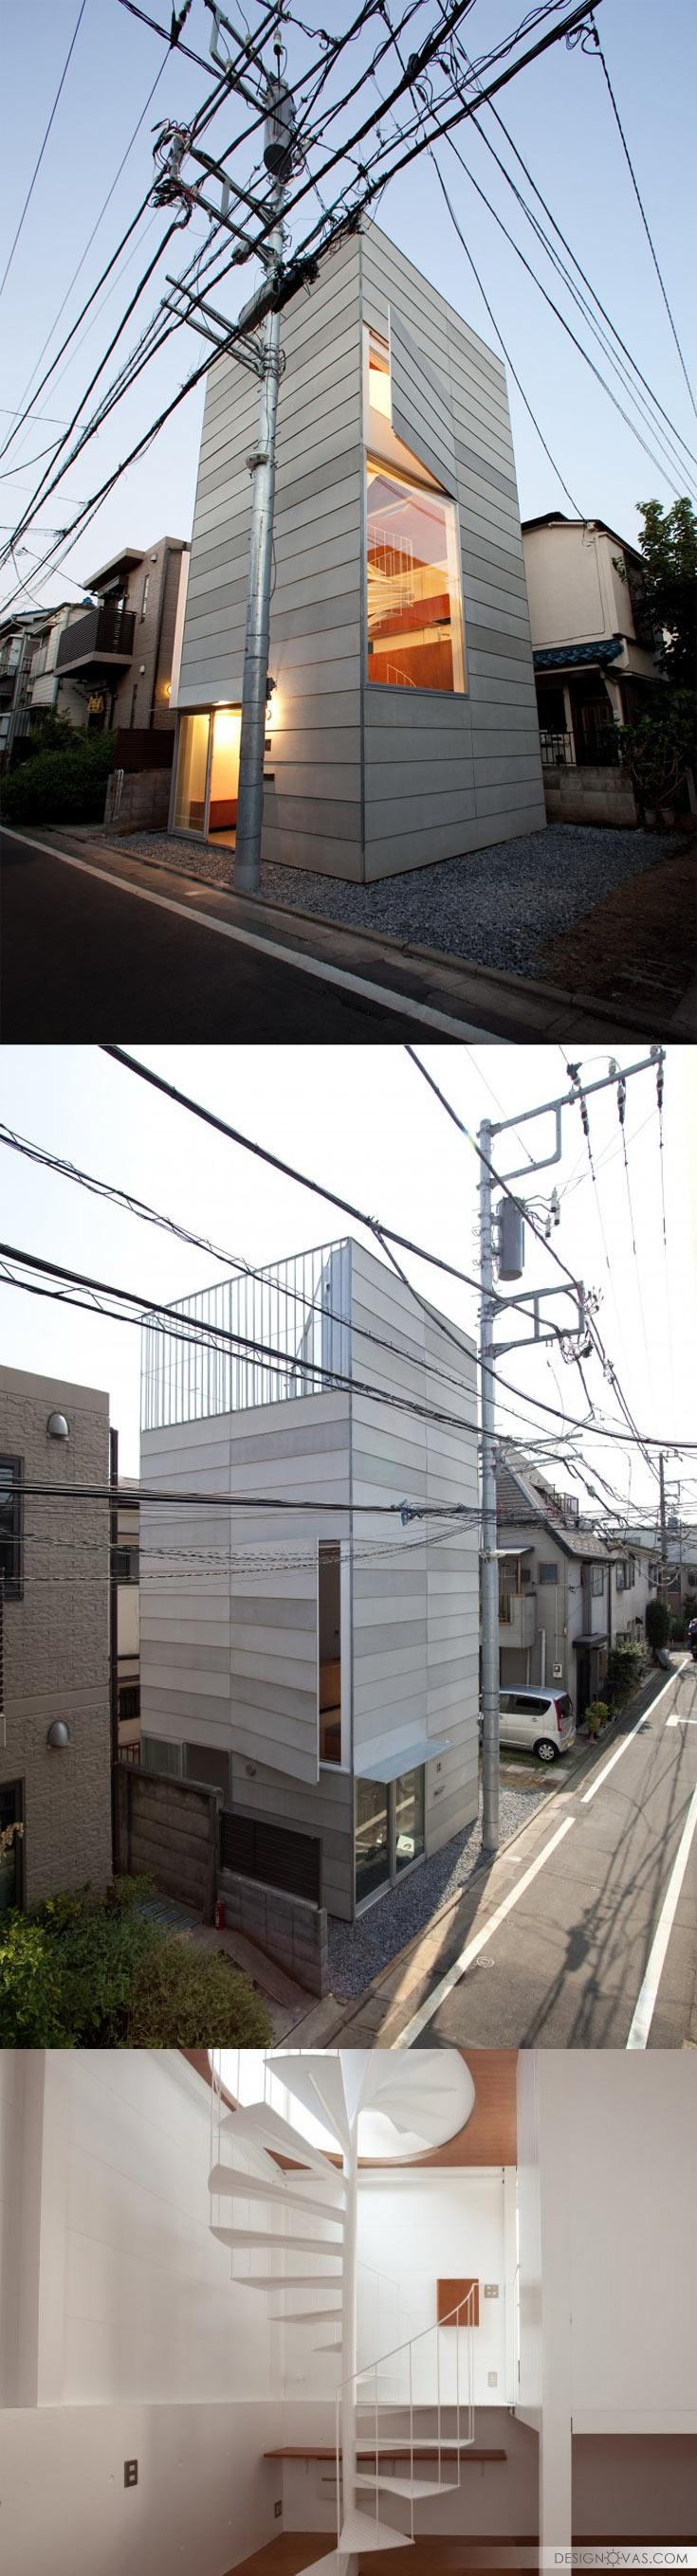 01-modern-houses